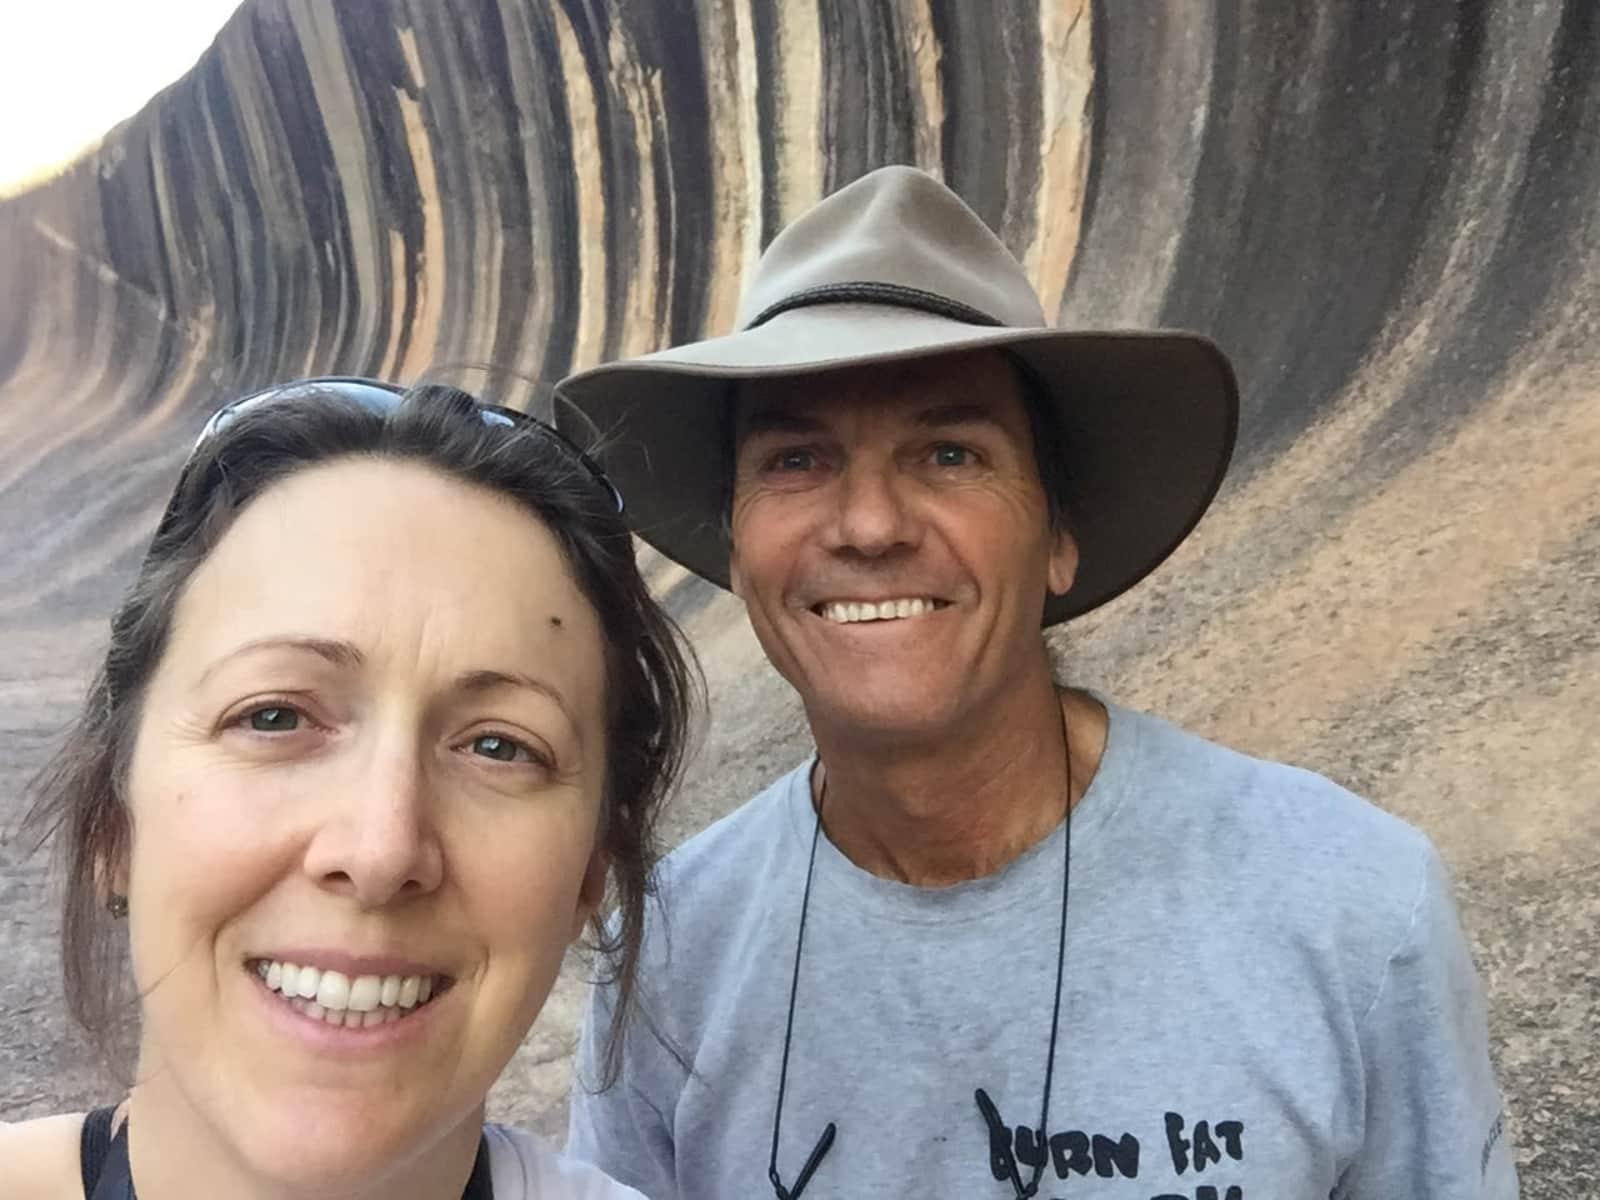 Angela & Mark from Perth, Western Australia, Australia